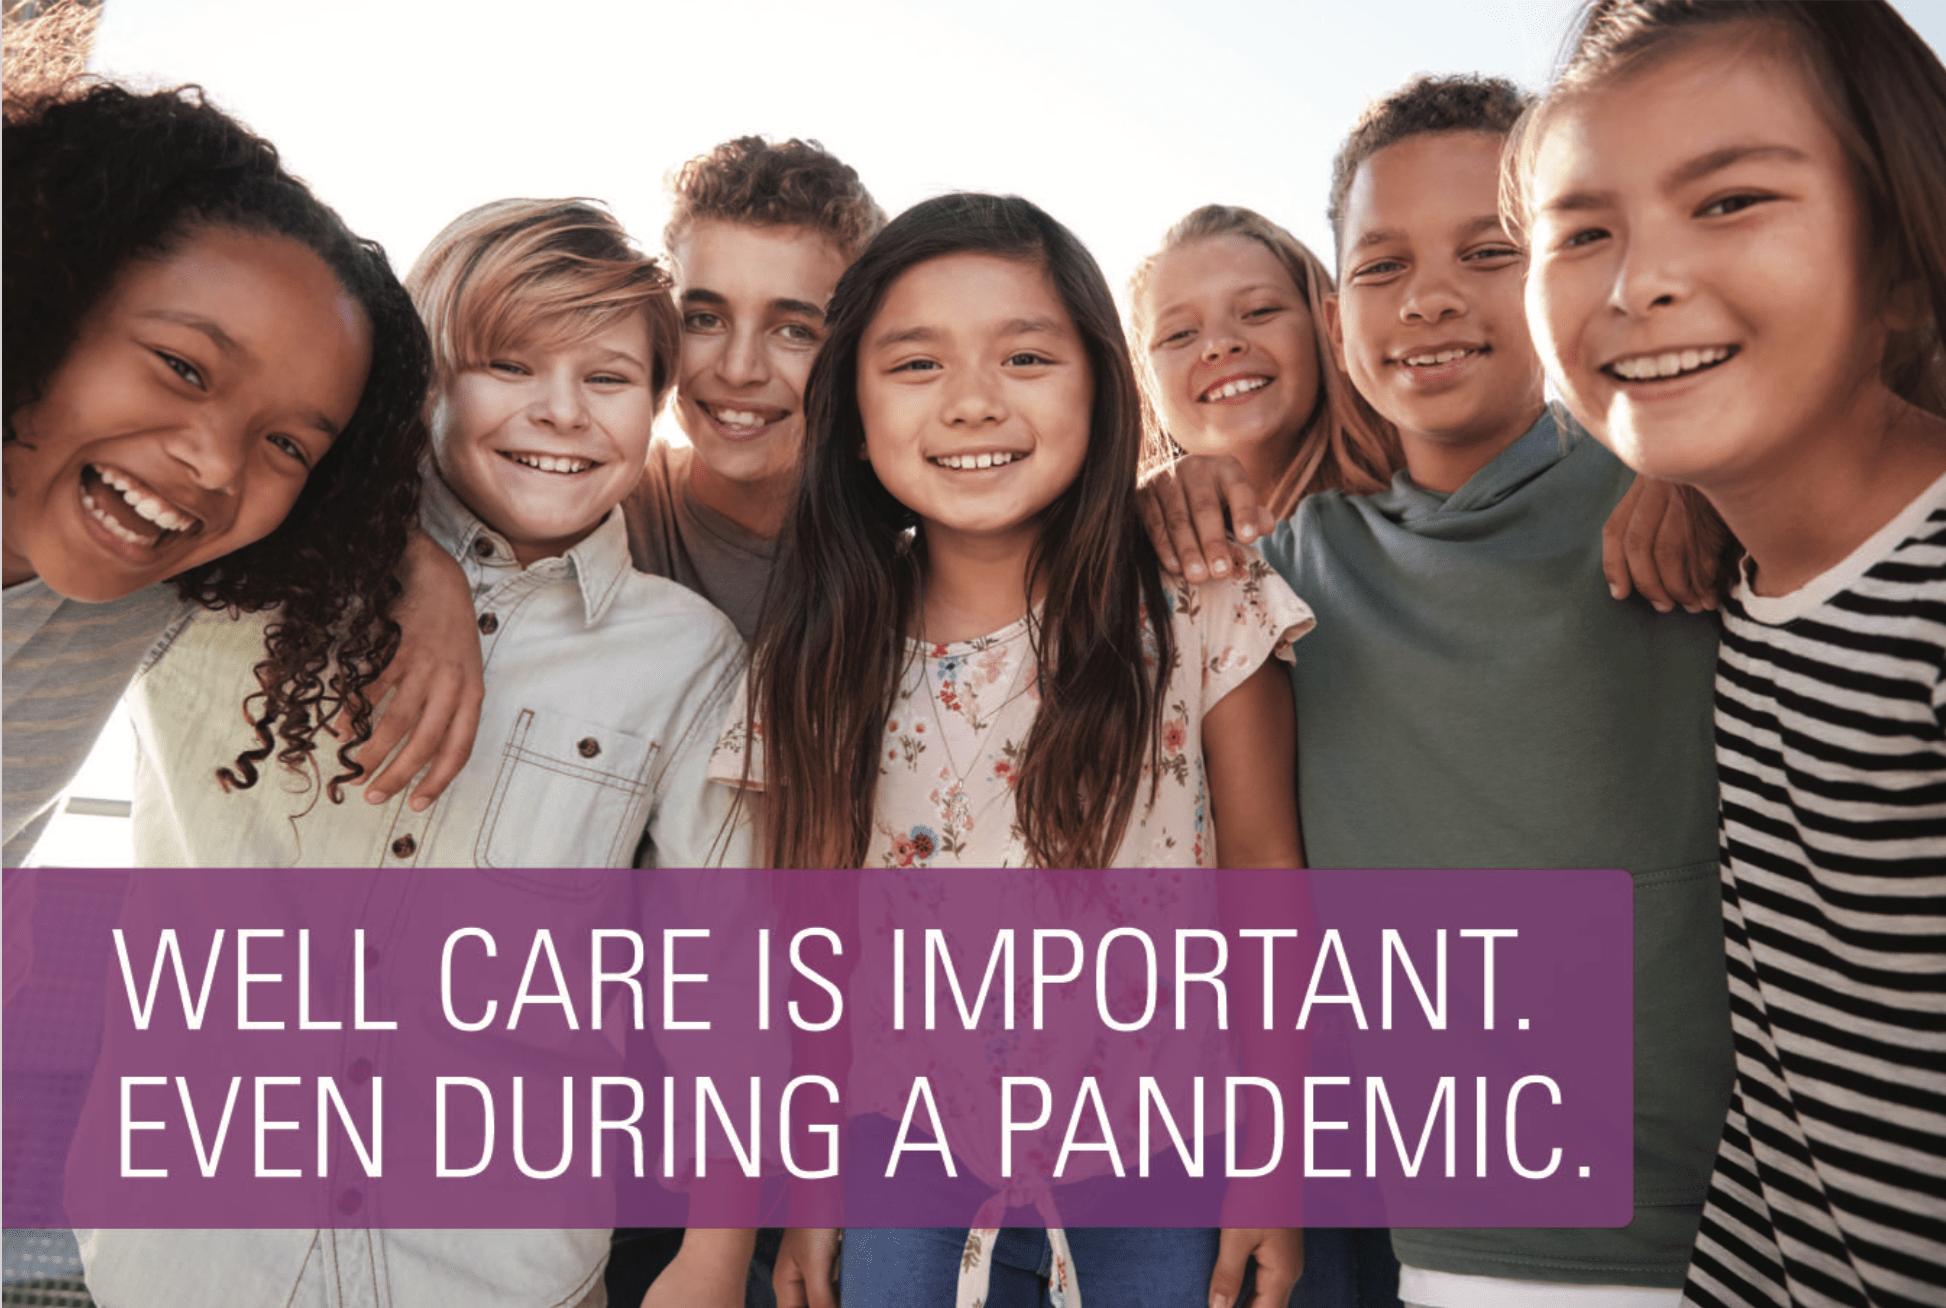 Advanced Pediatric Associates Colorado pediatricians